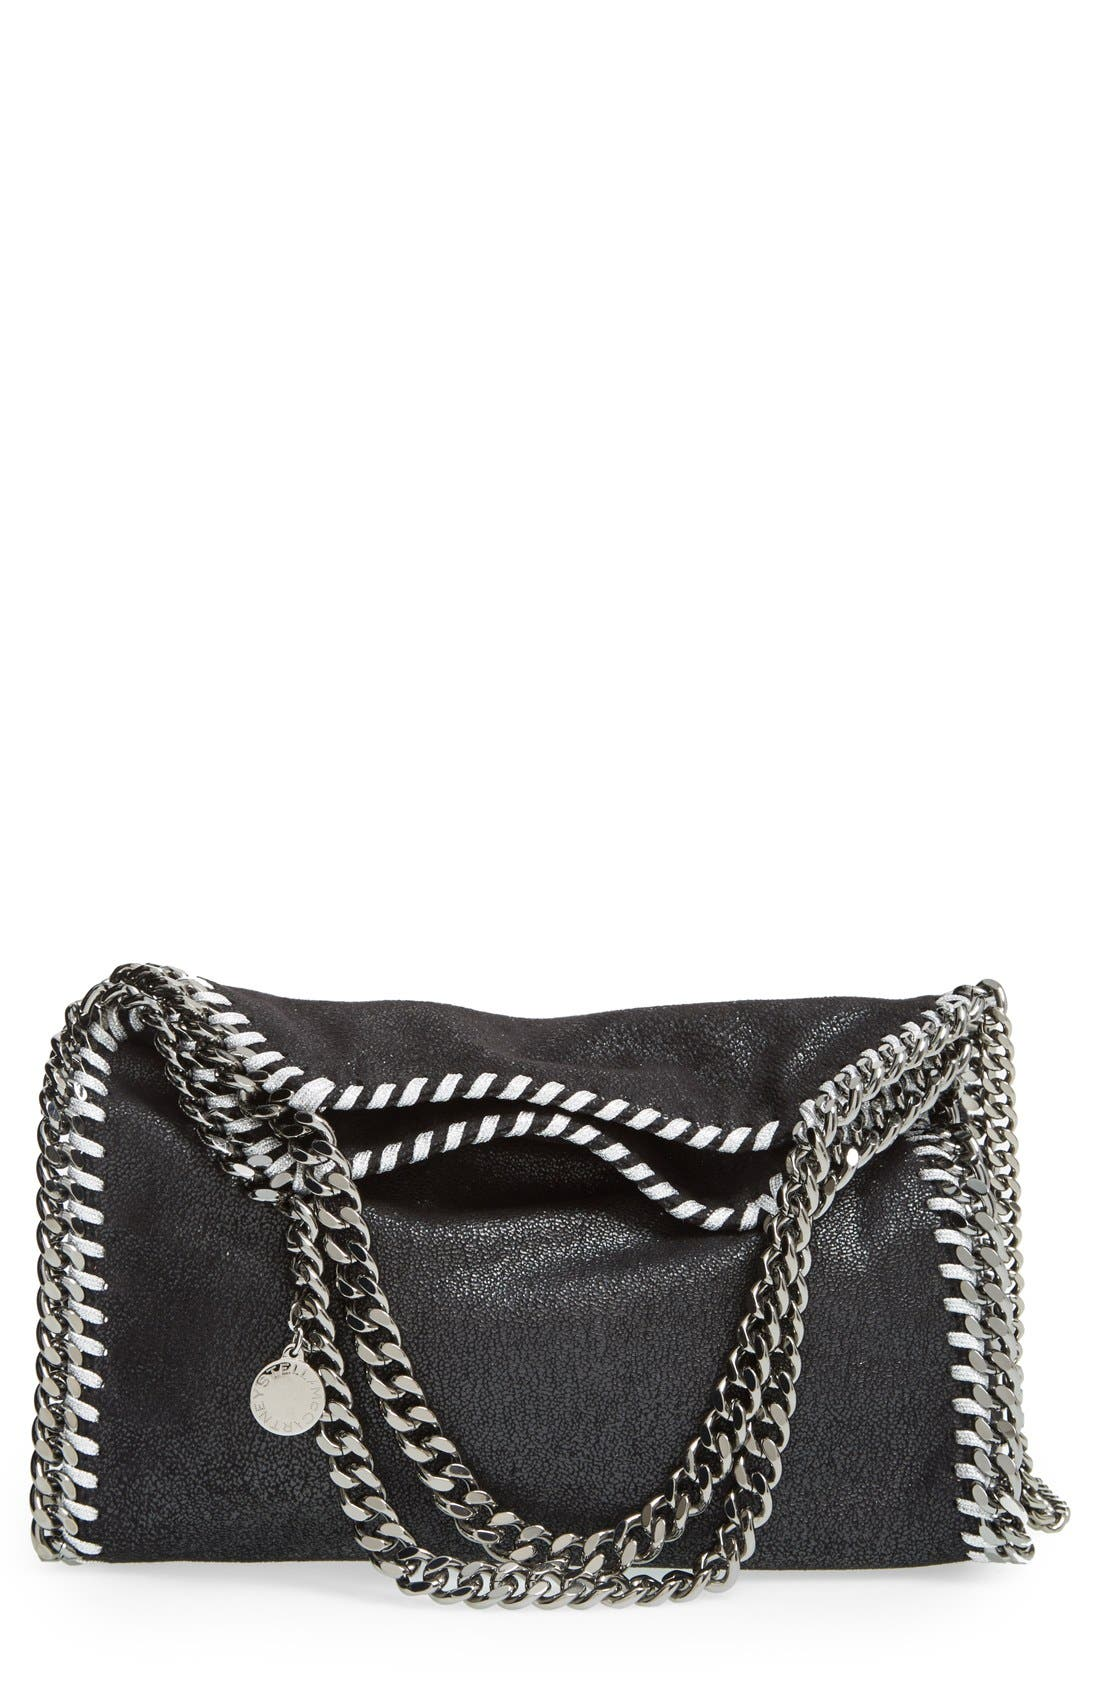 'Mini Falabella - Shaggy Deer' Faux Leather Tote,                         Main,                         color, BLACK W/ SILVER